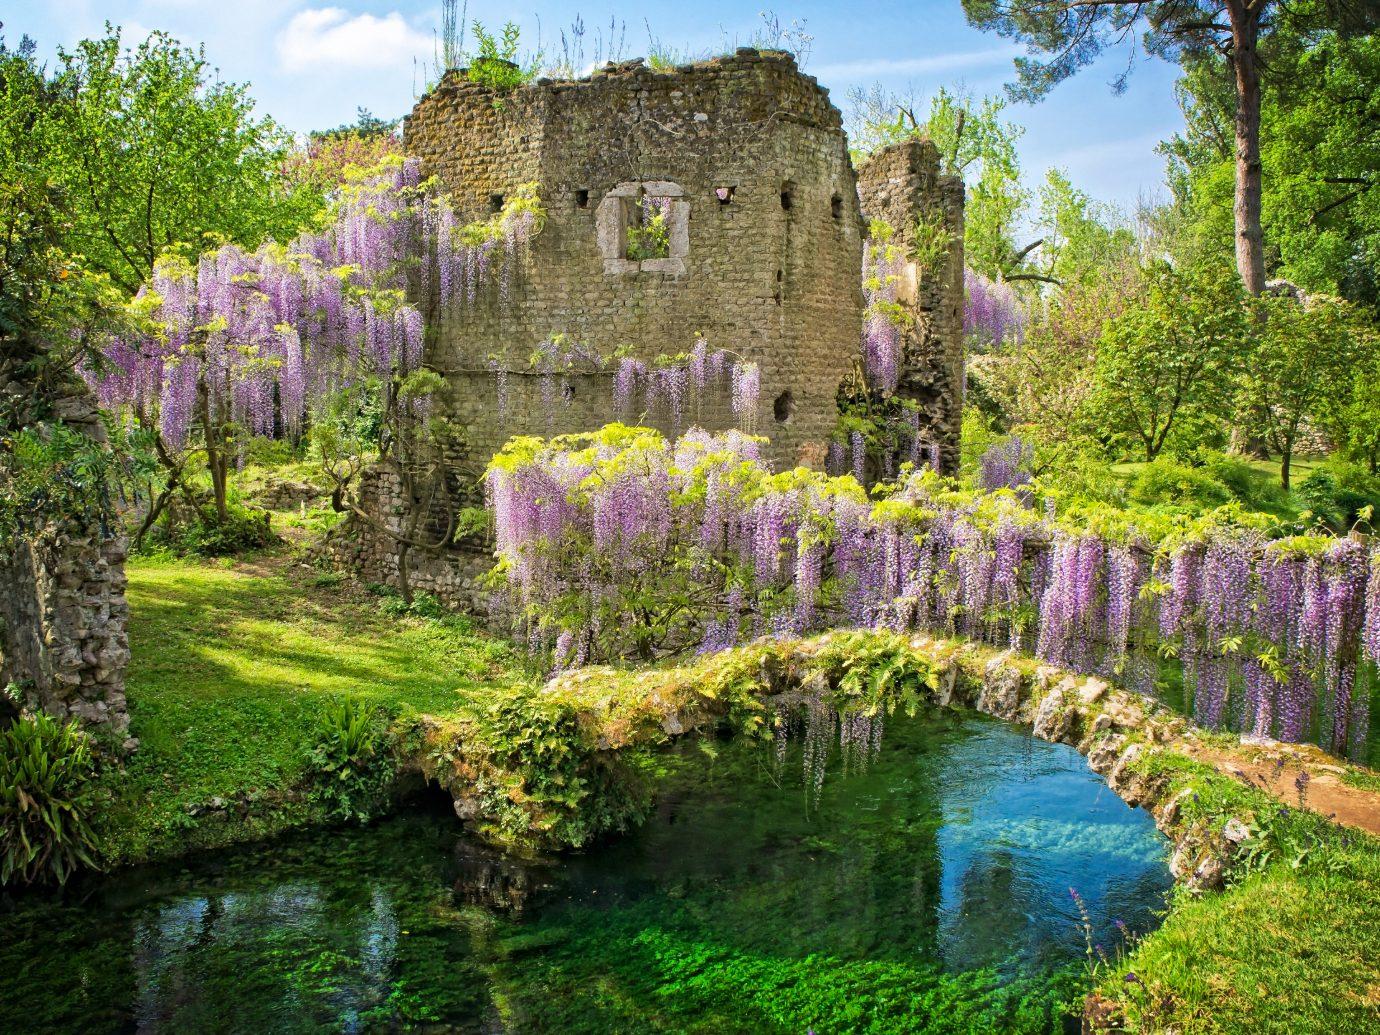 Beautiful view of the Gardens of Ninfa